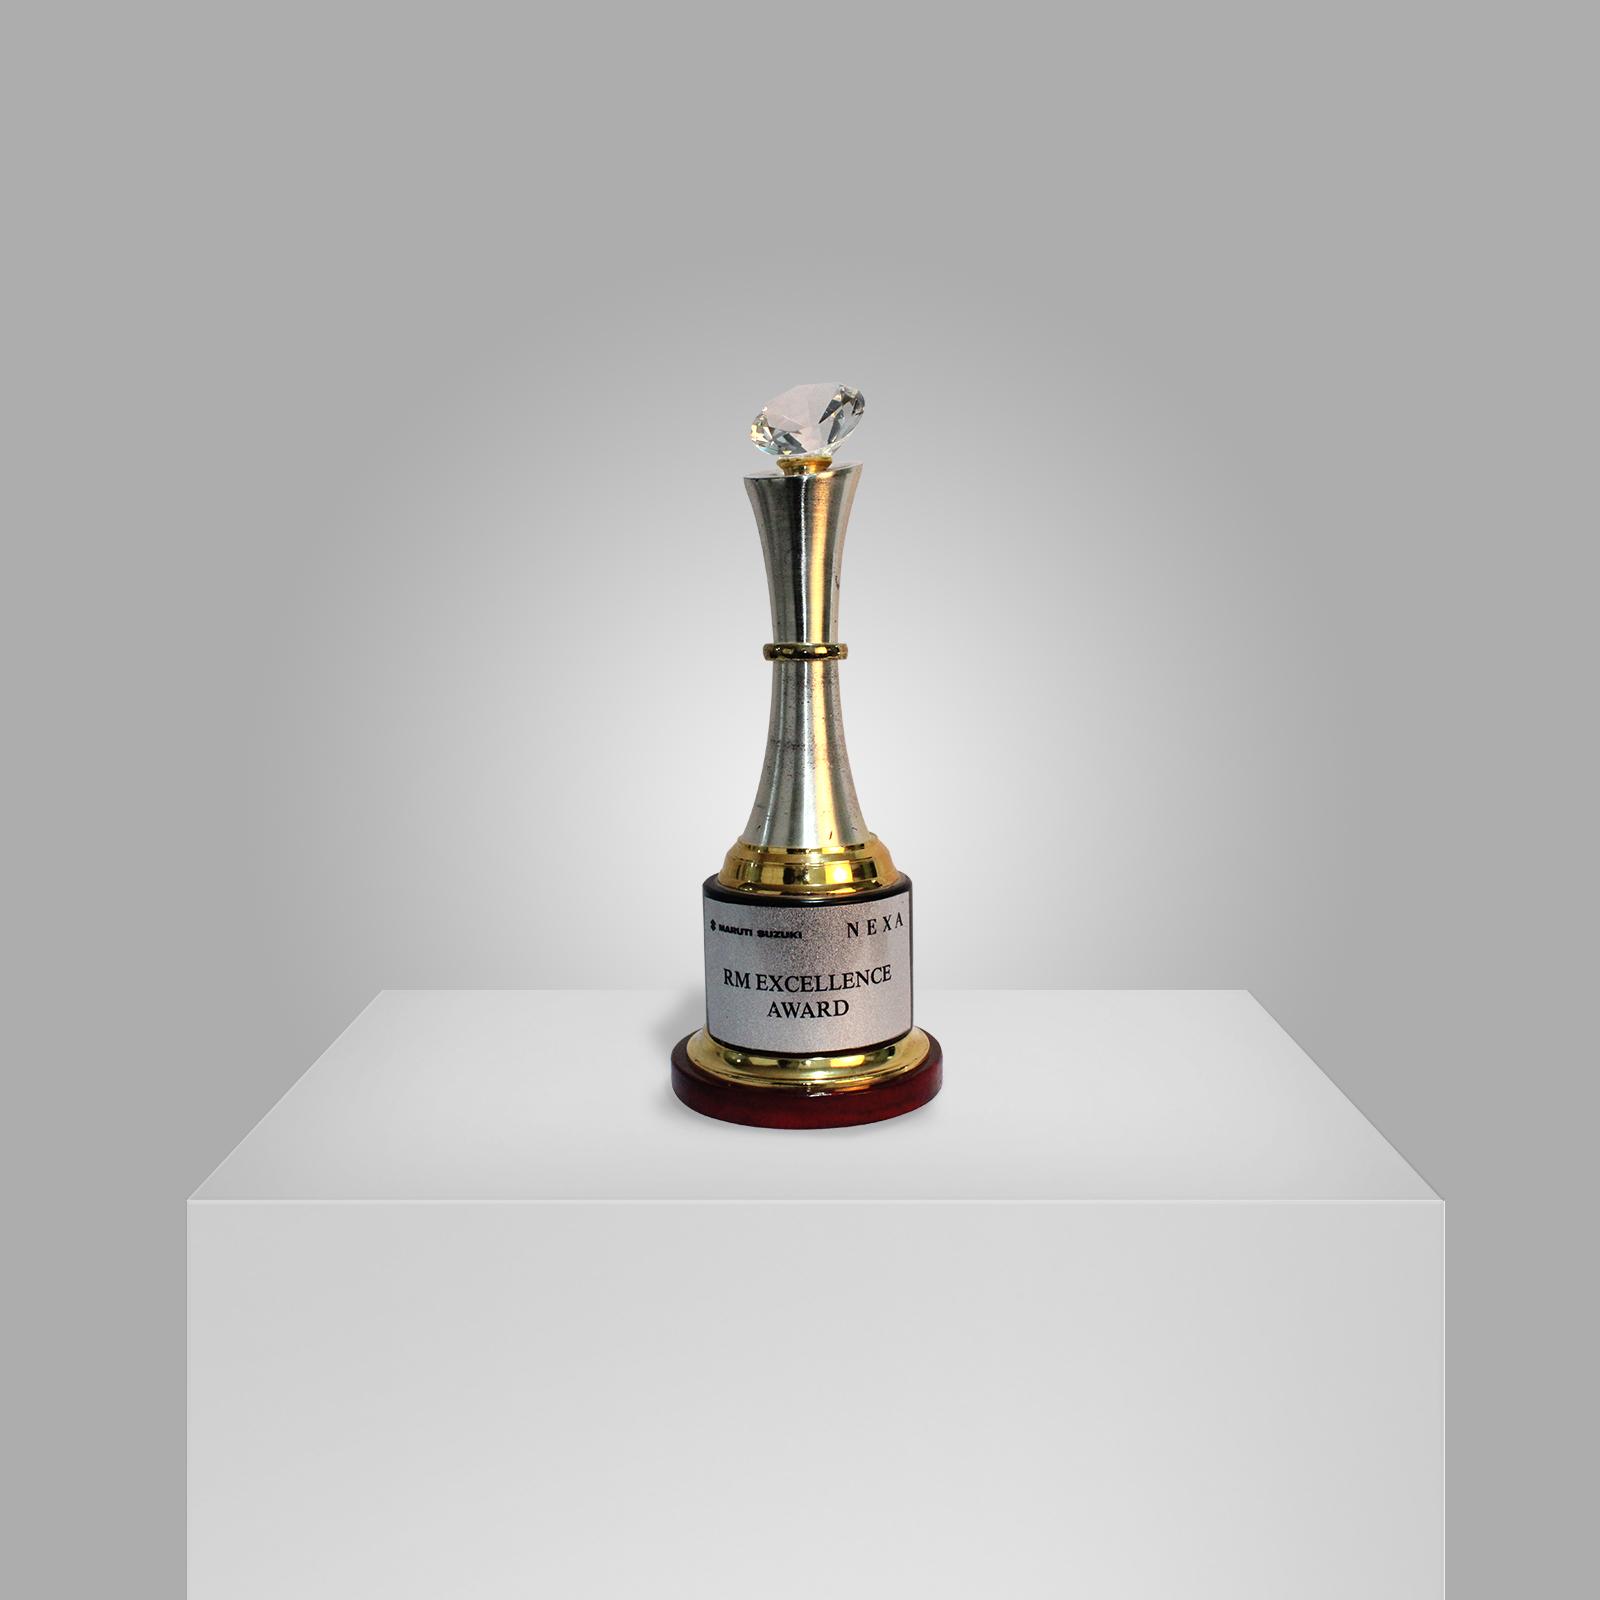 Maruti-suzuki-rm-excellence-award